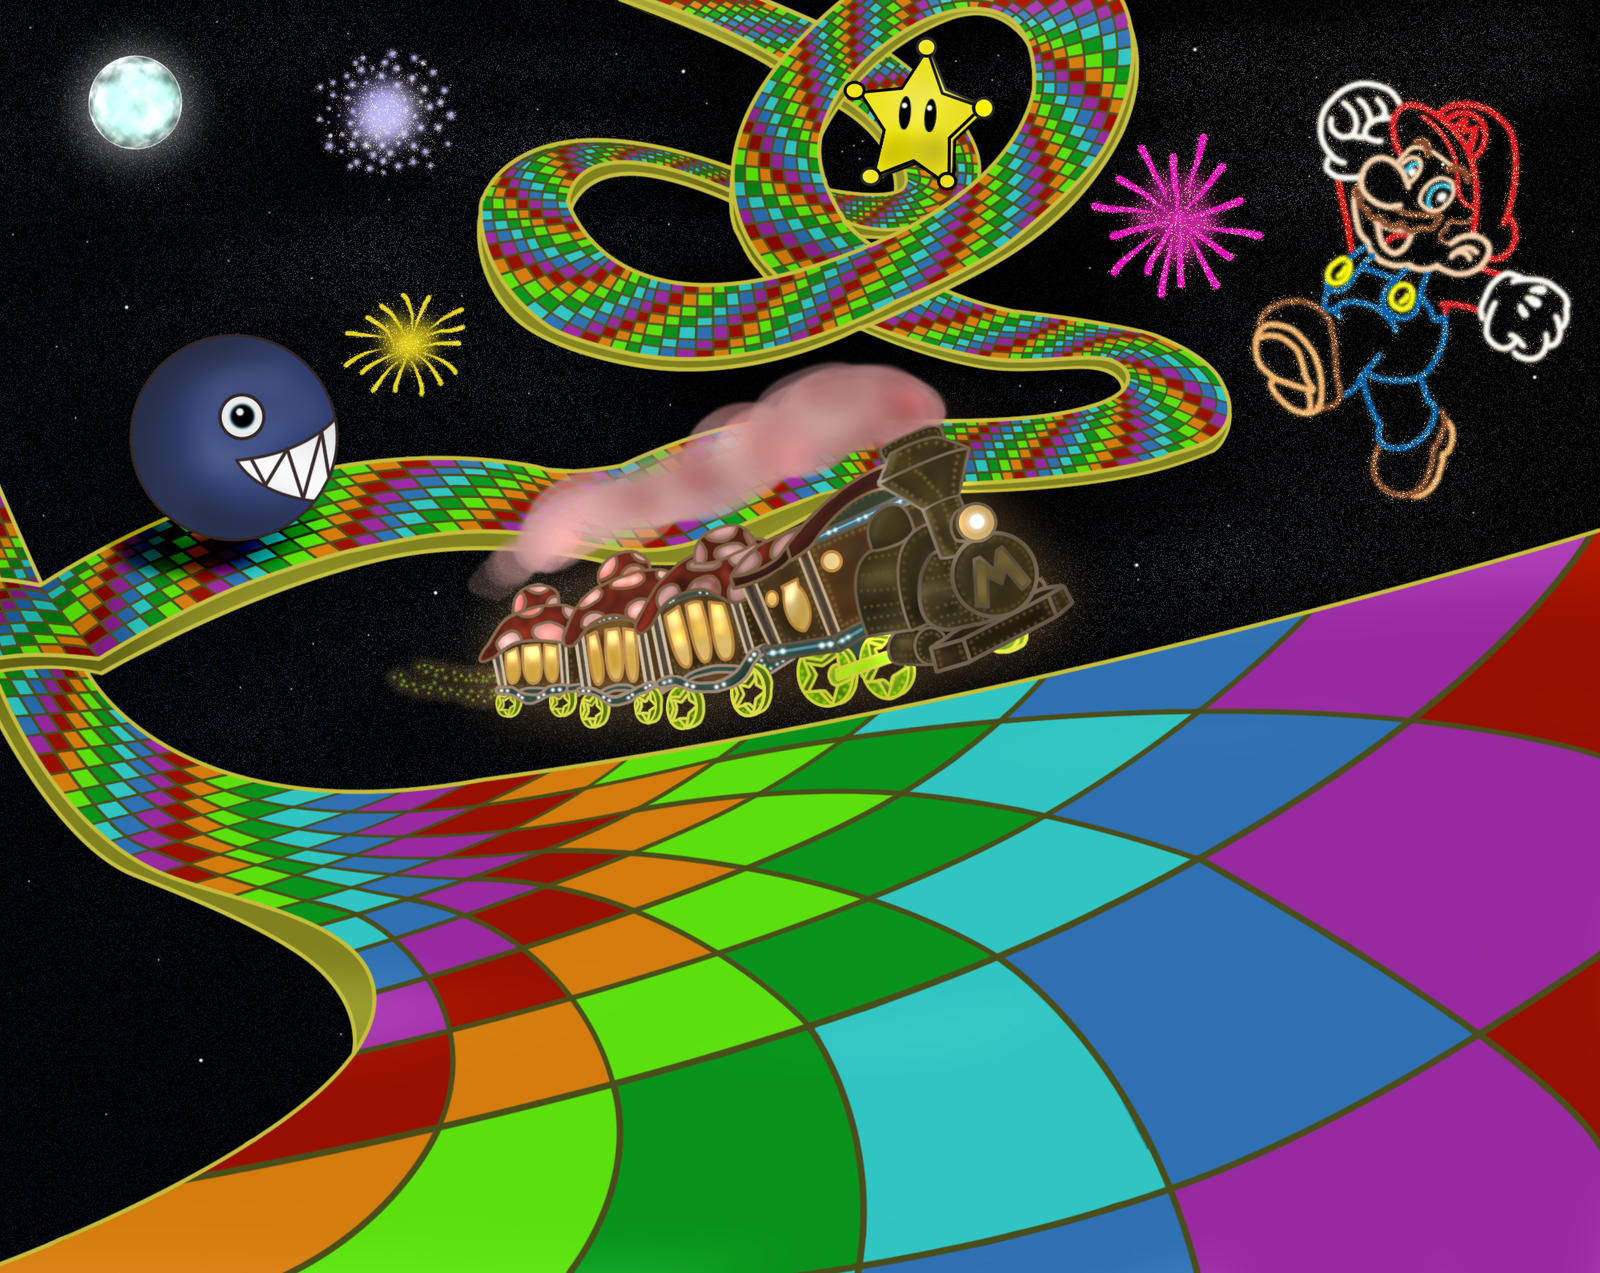 N64 Rainbow Road By Ny Disney Fan1955 On Deviantart